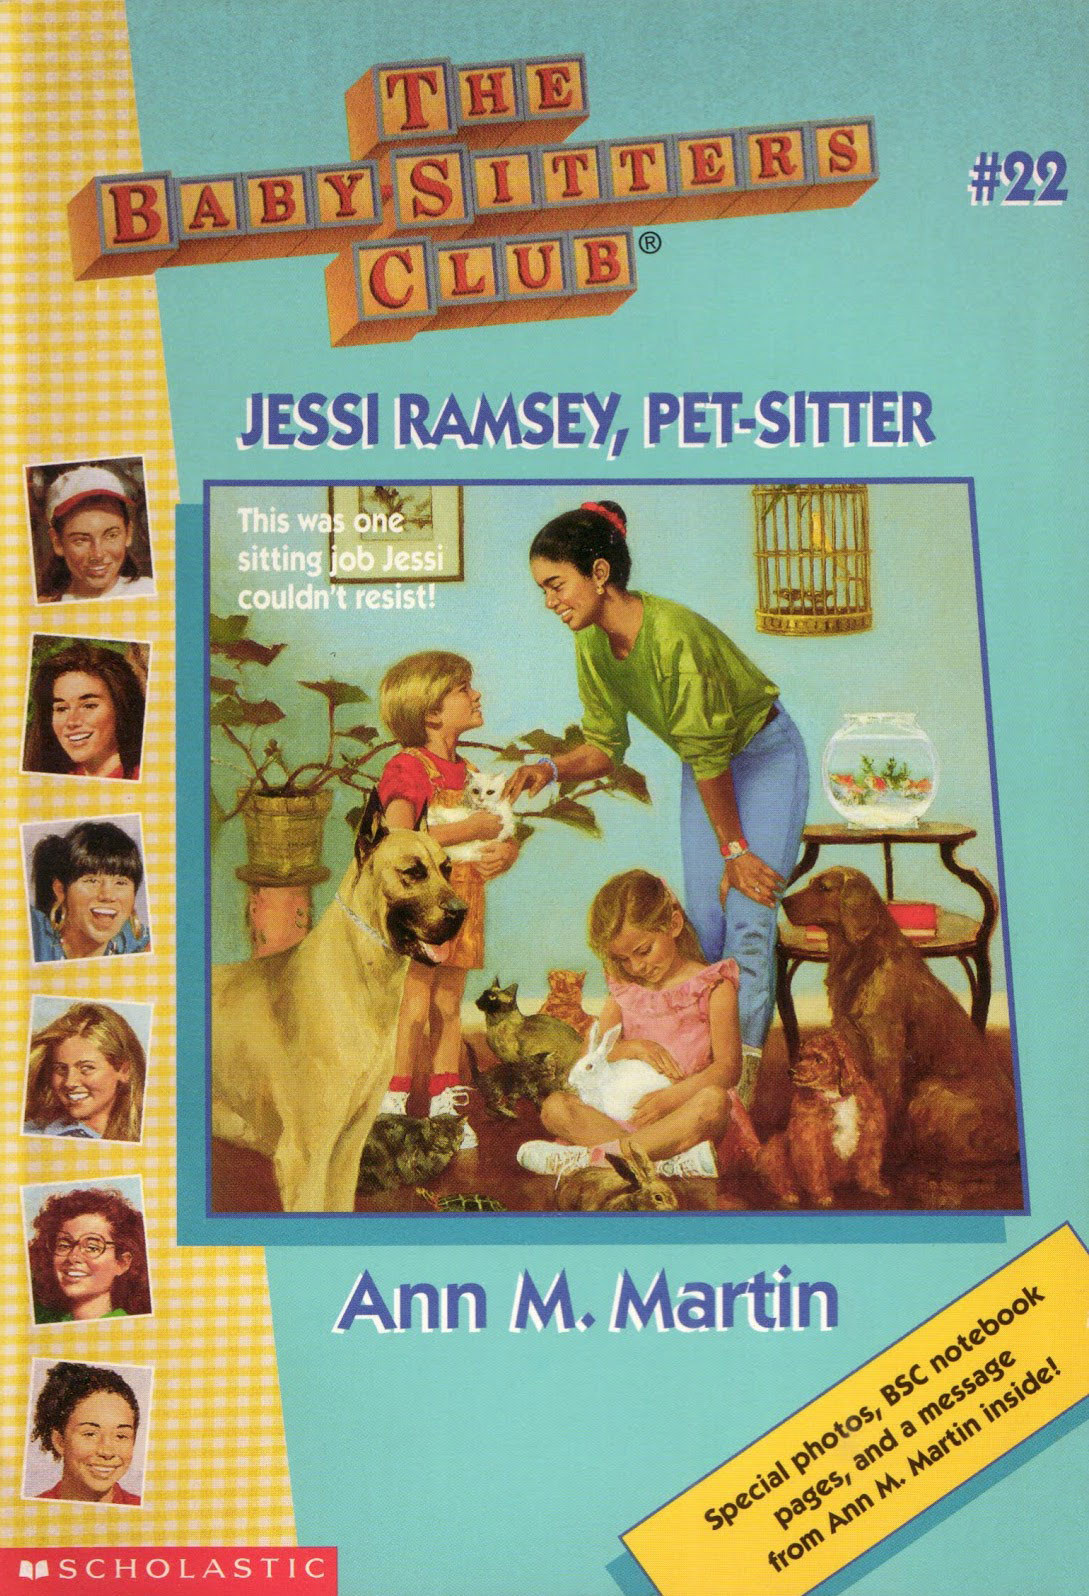 jessi ramsey pet sitter the baby sitters club wiki fandom